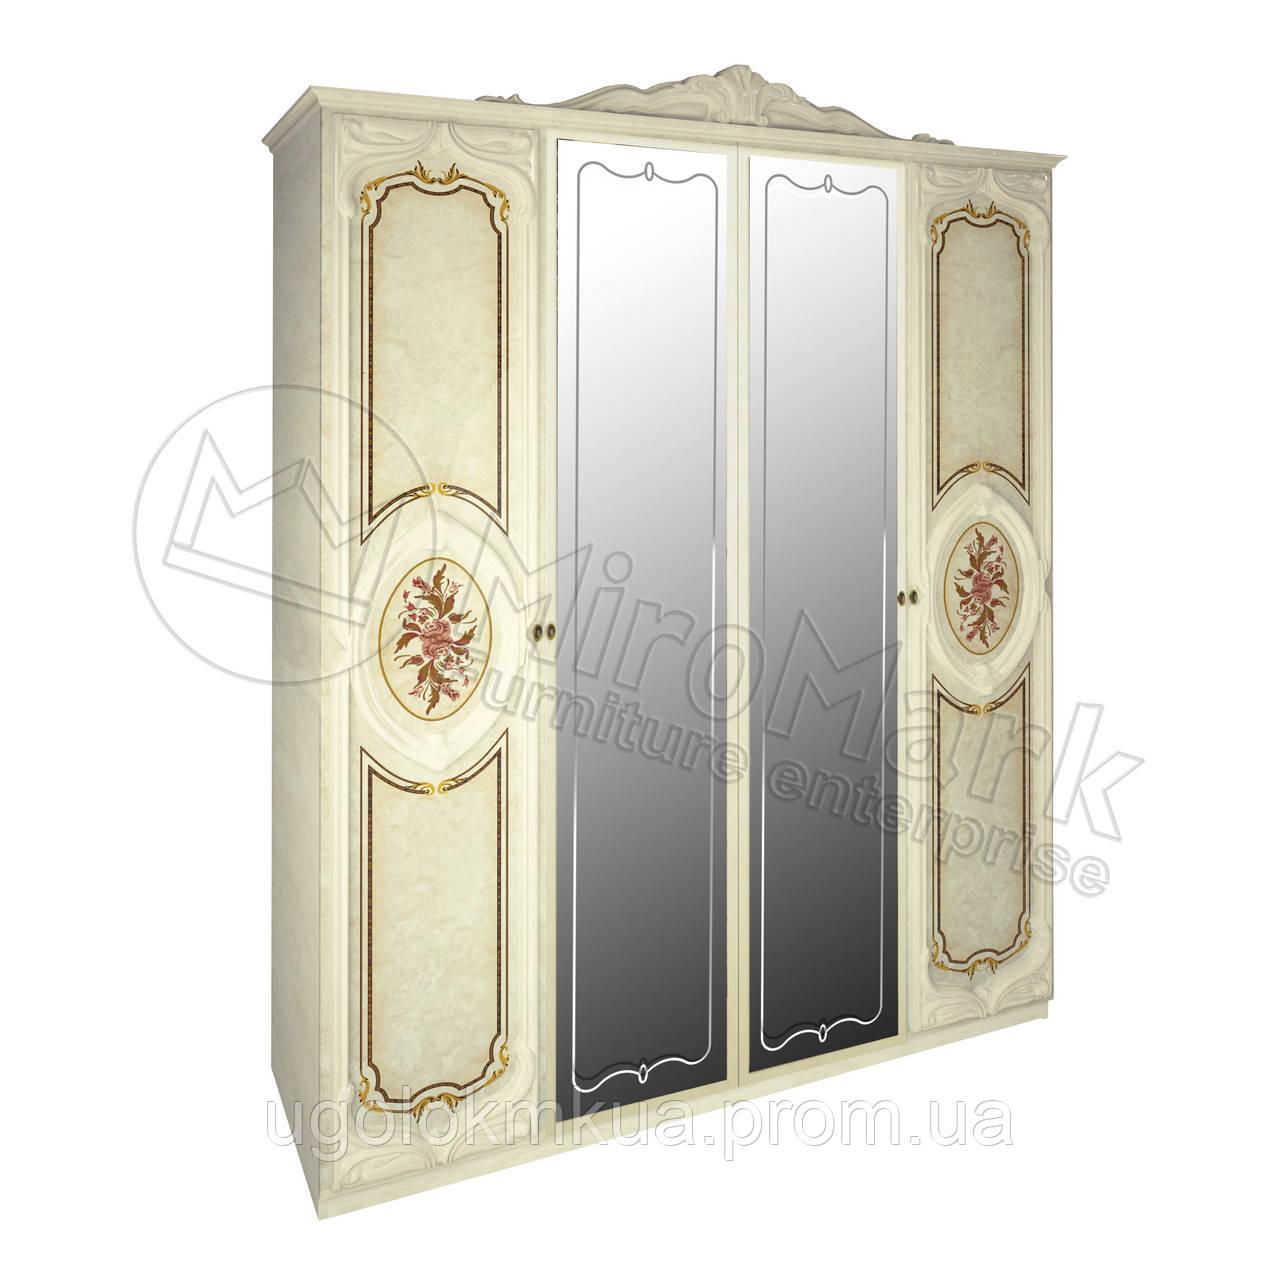 Спальня Реджина радика беж шкаф 4Д с зеркалами